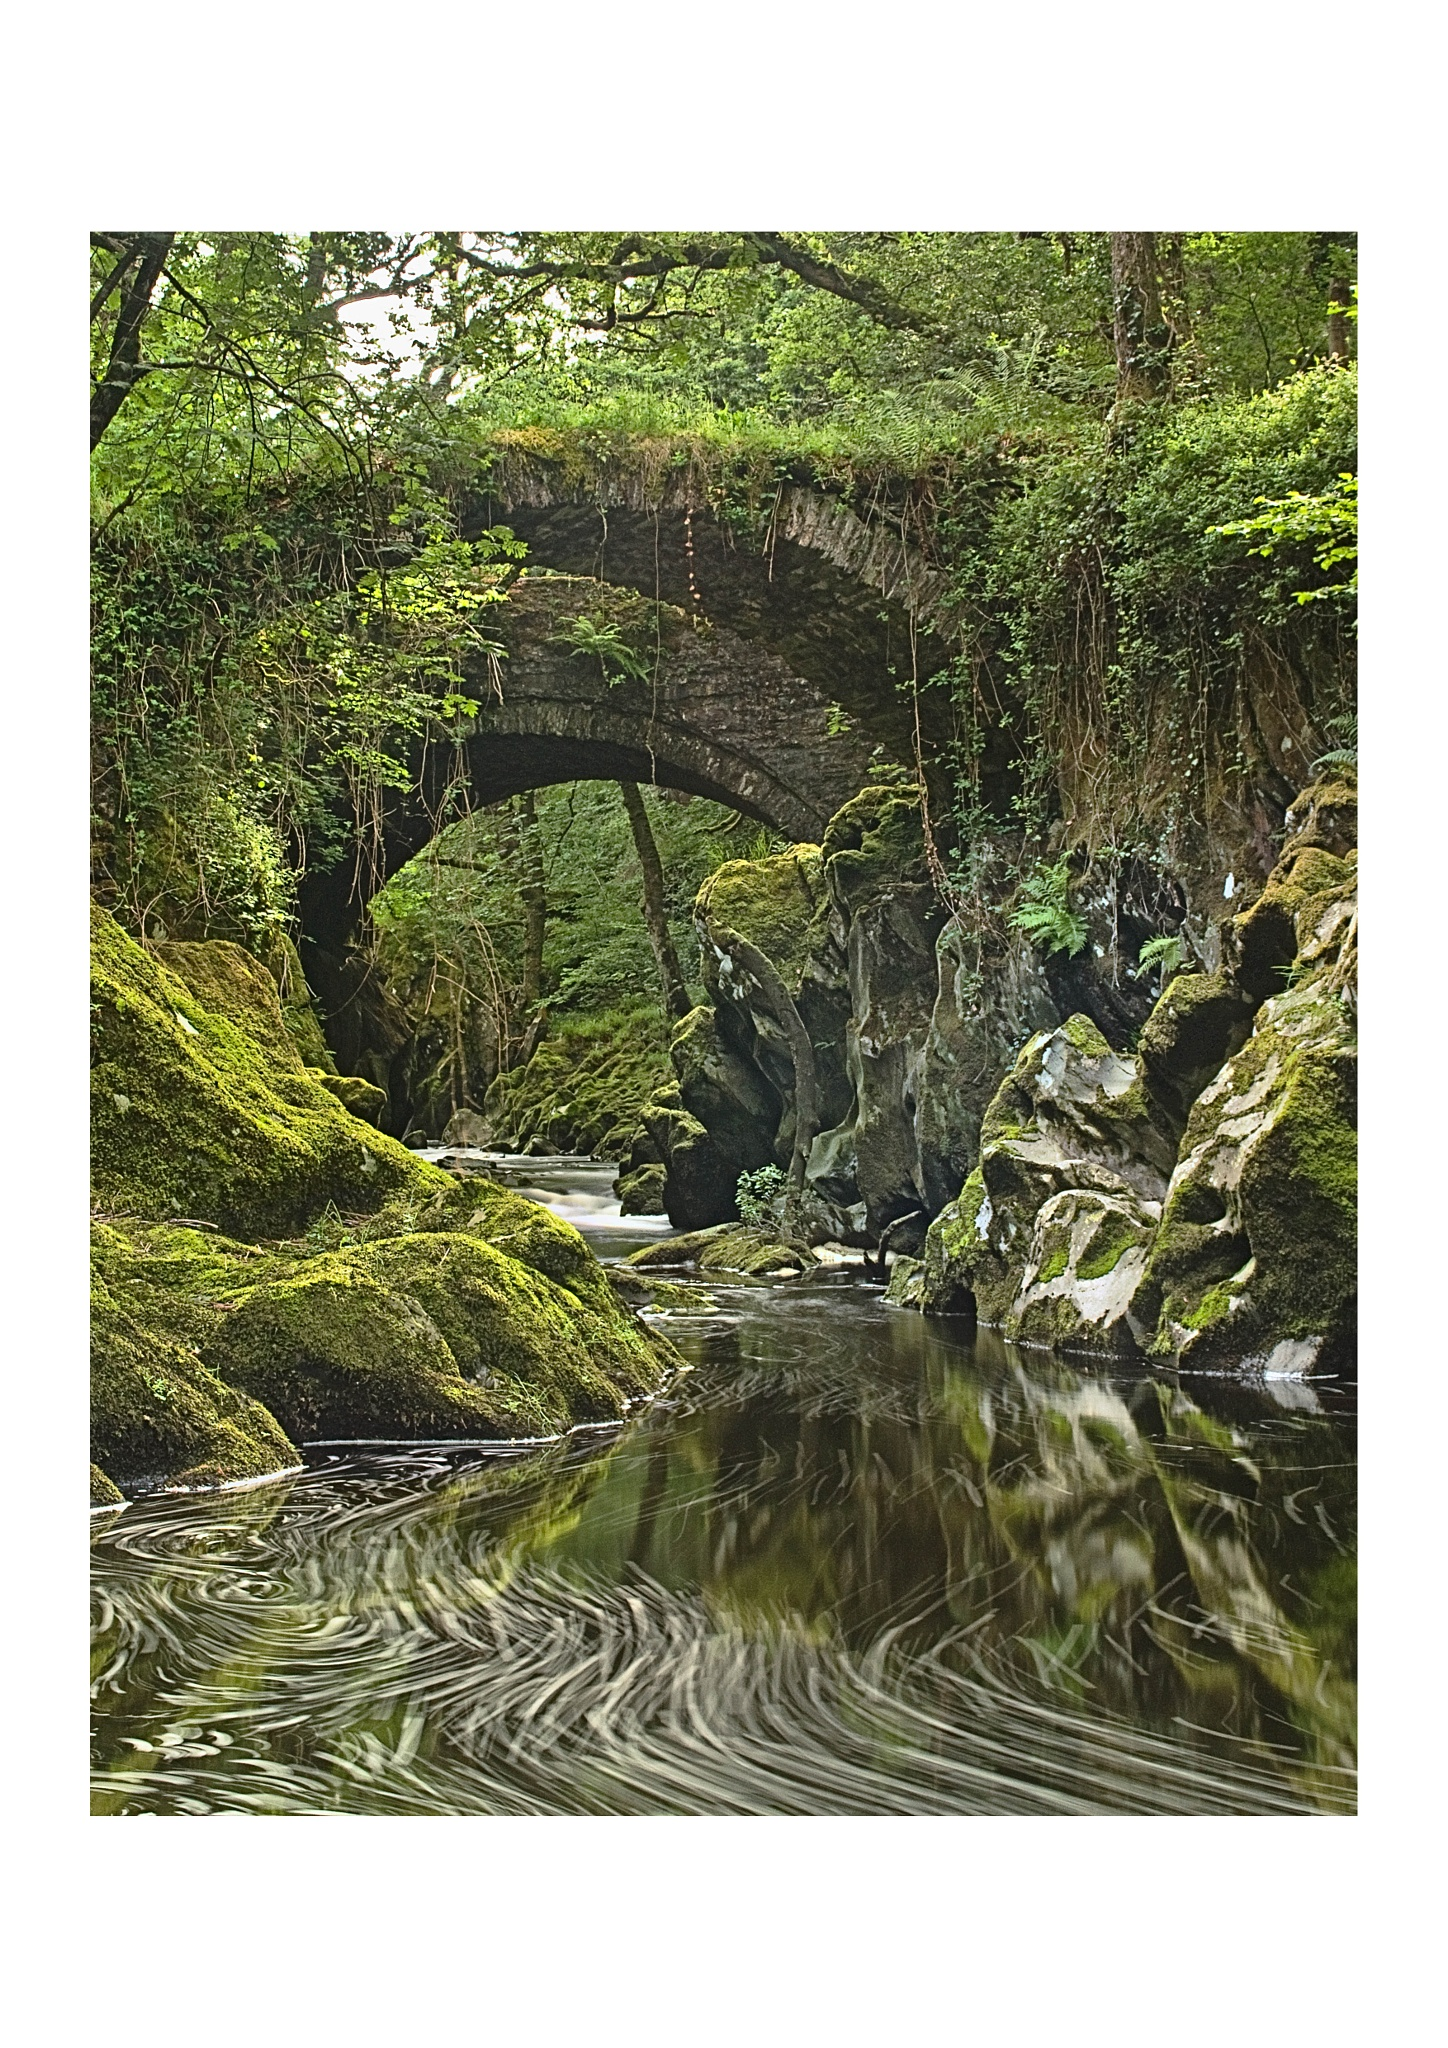 Roman Bridges Penmachno by DaveJones